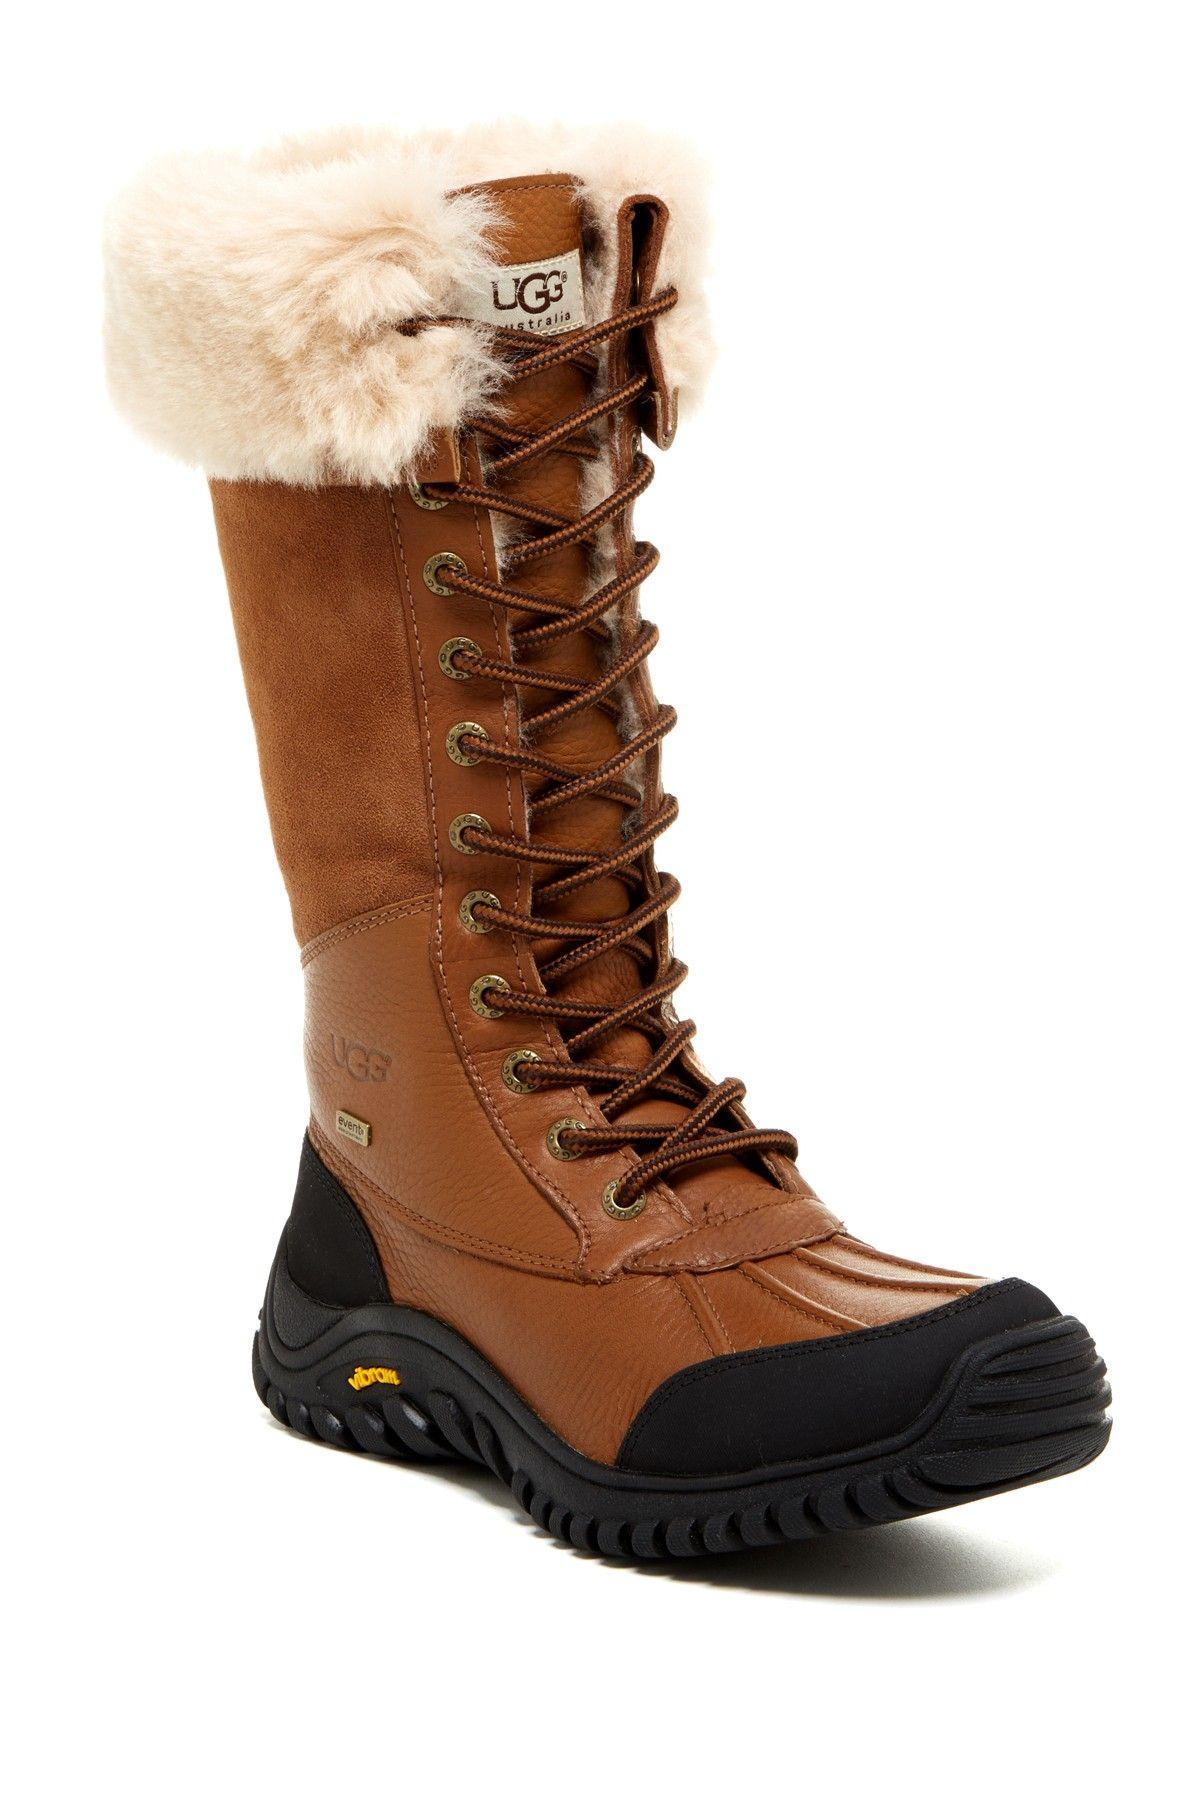 UGG Australia | Adirondack Tall Boot $324.95